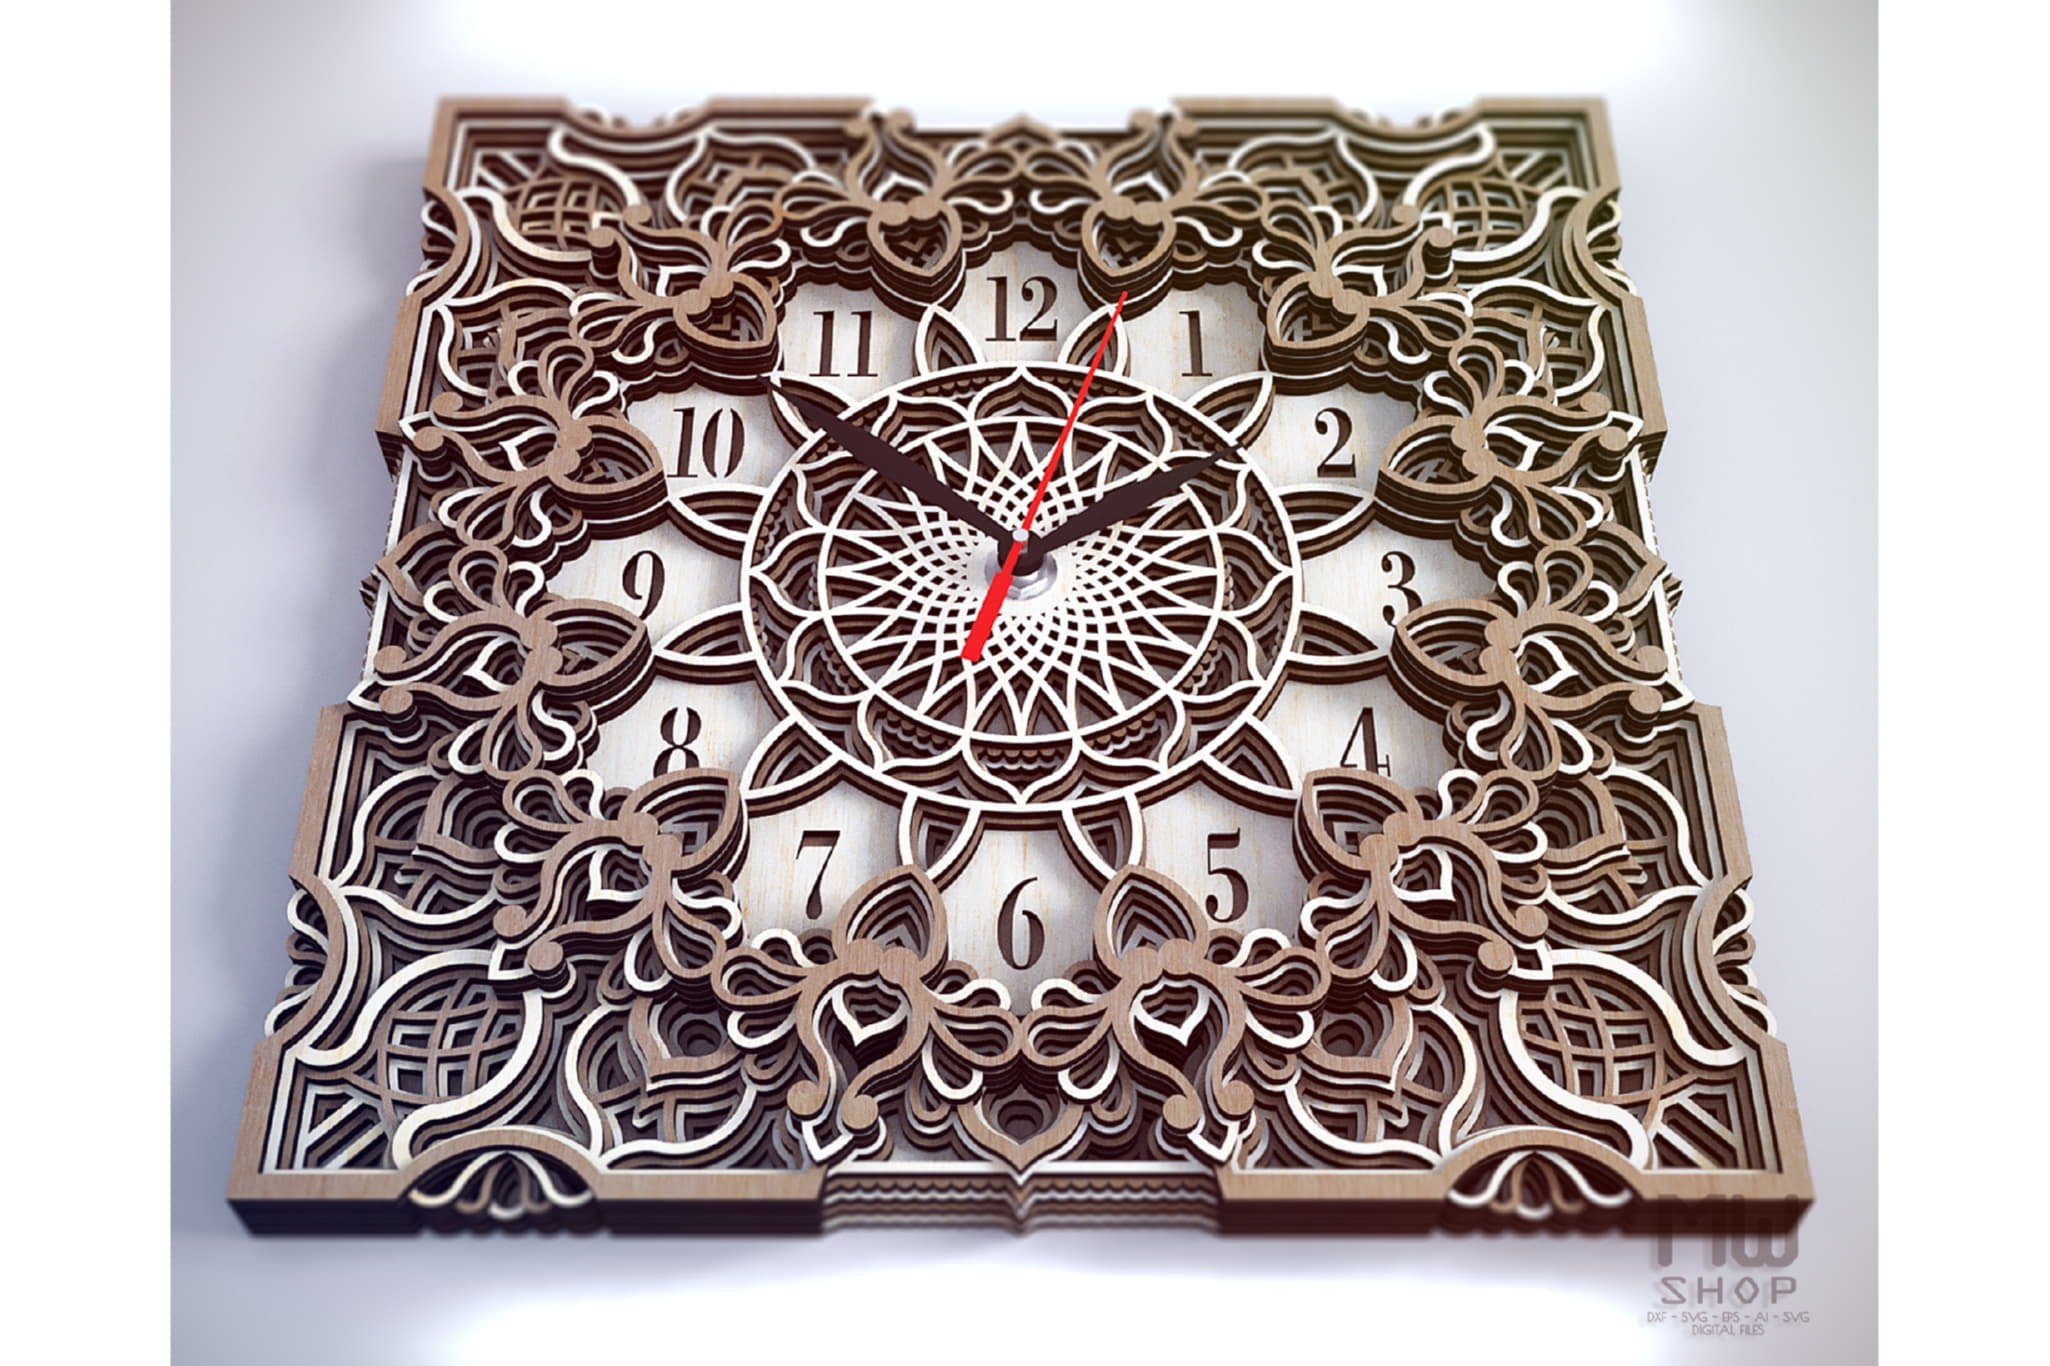 C13 - Mandala Clock DXF for Laser cut, Sacred Clock SVG example image 5